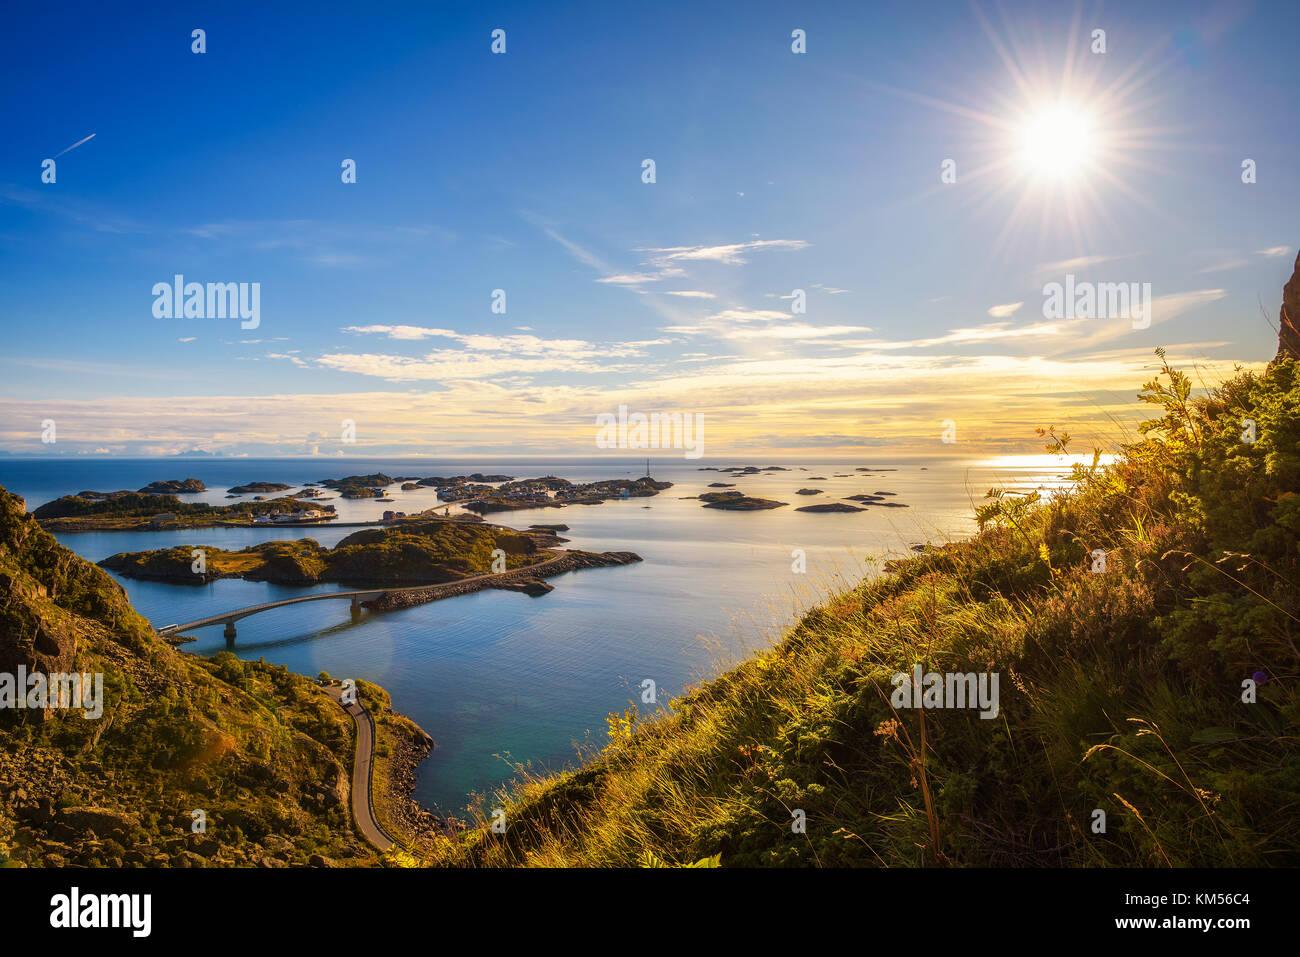 Vista dal Monte festvagtind sopra il villaggio di henningsvaer, Norvegia Foto Stock